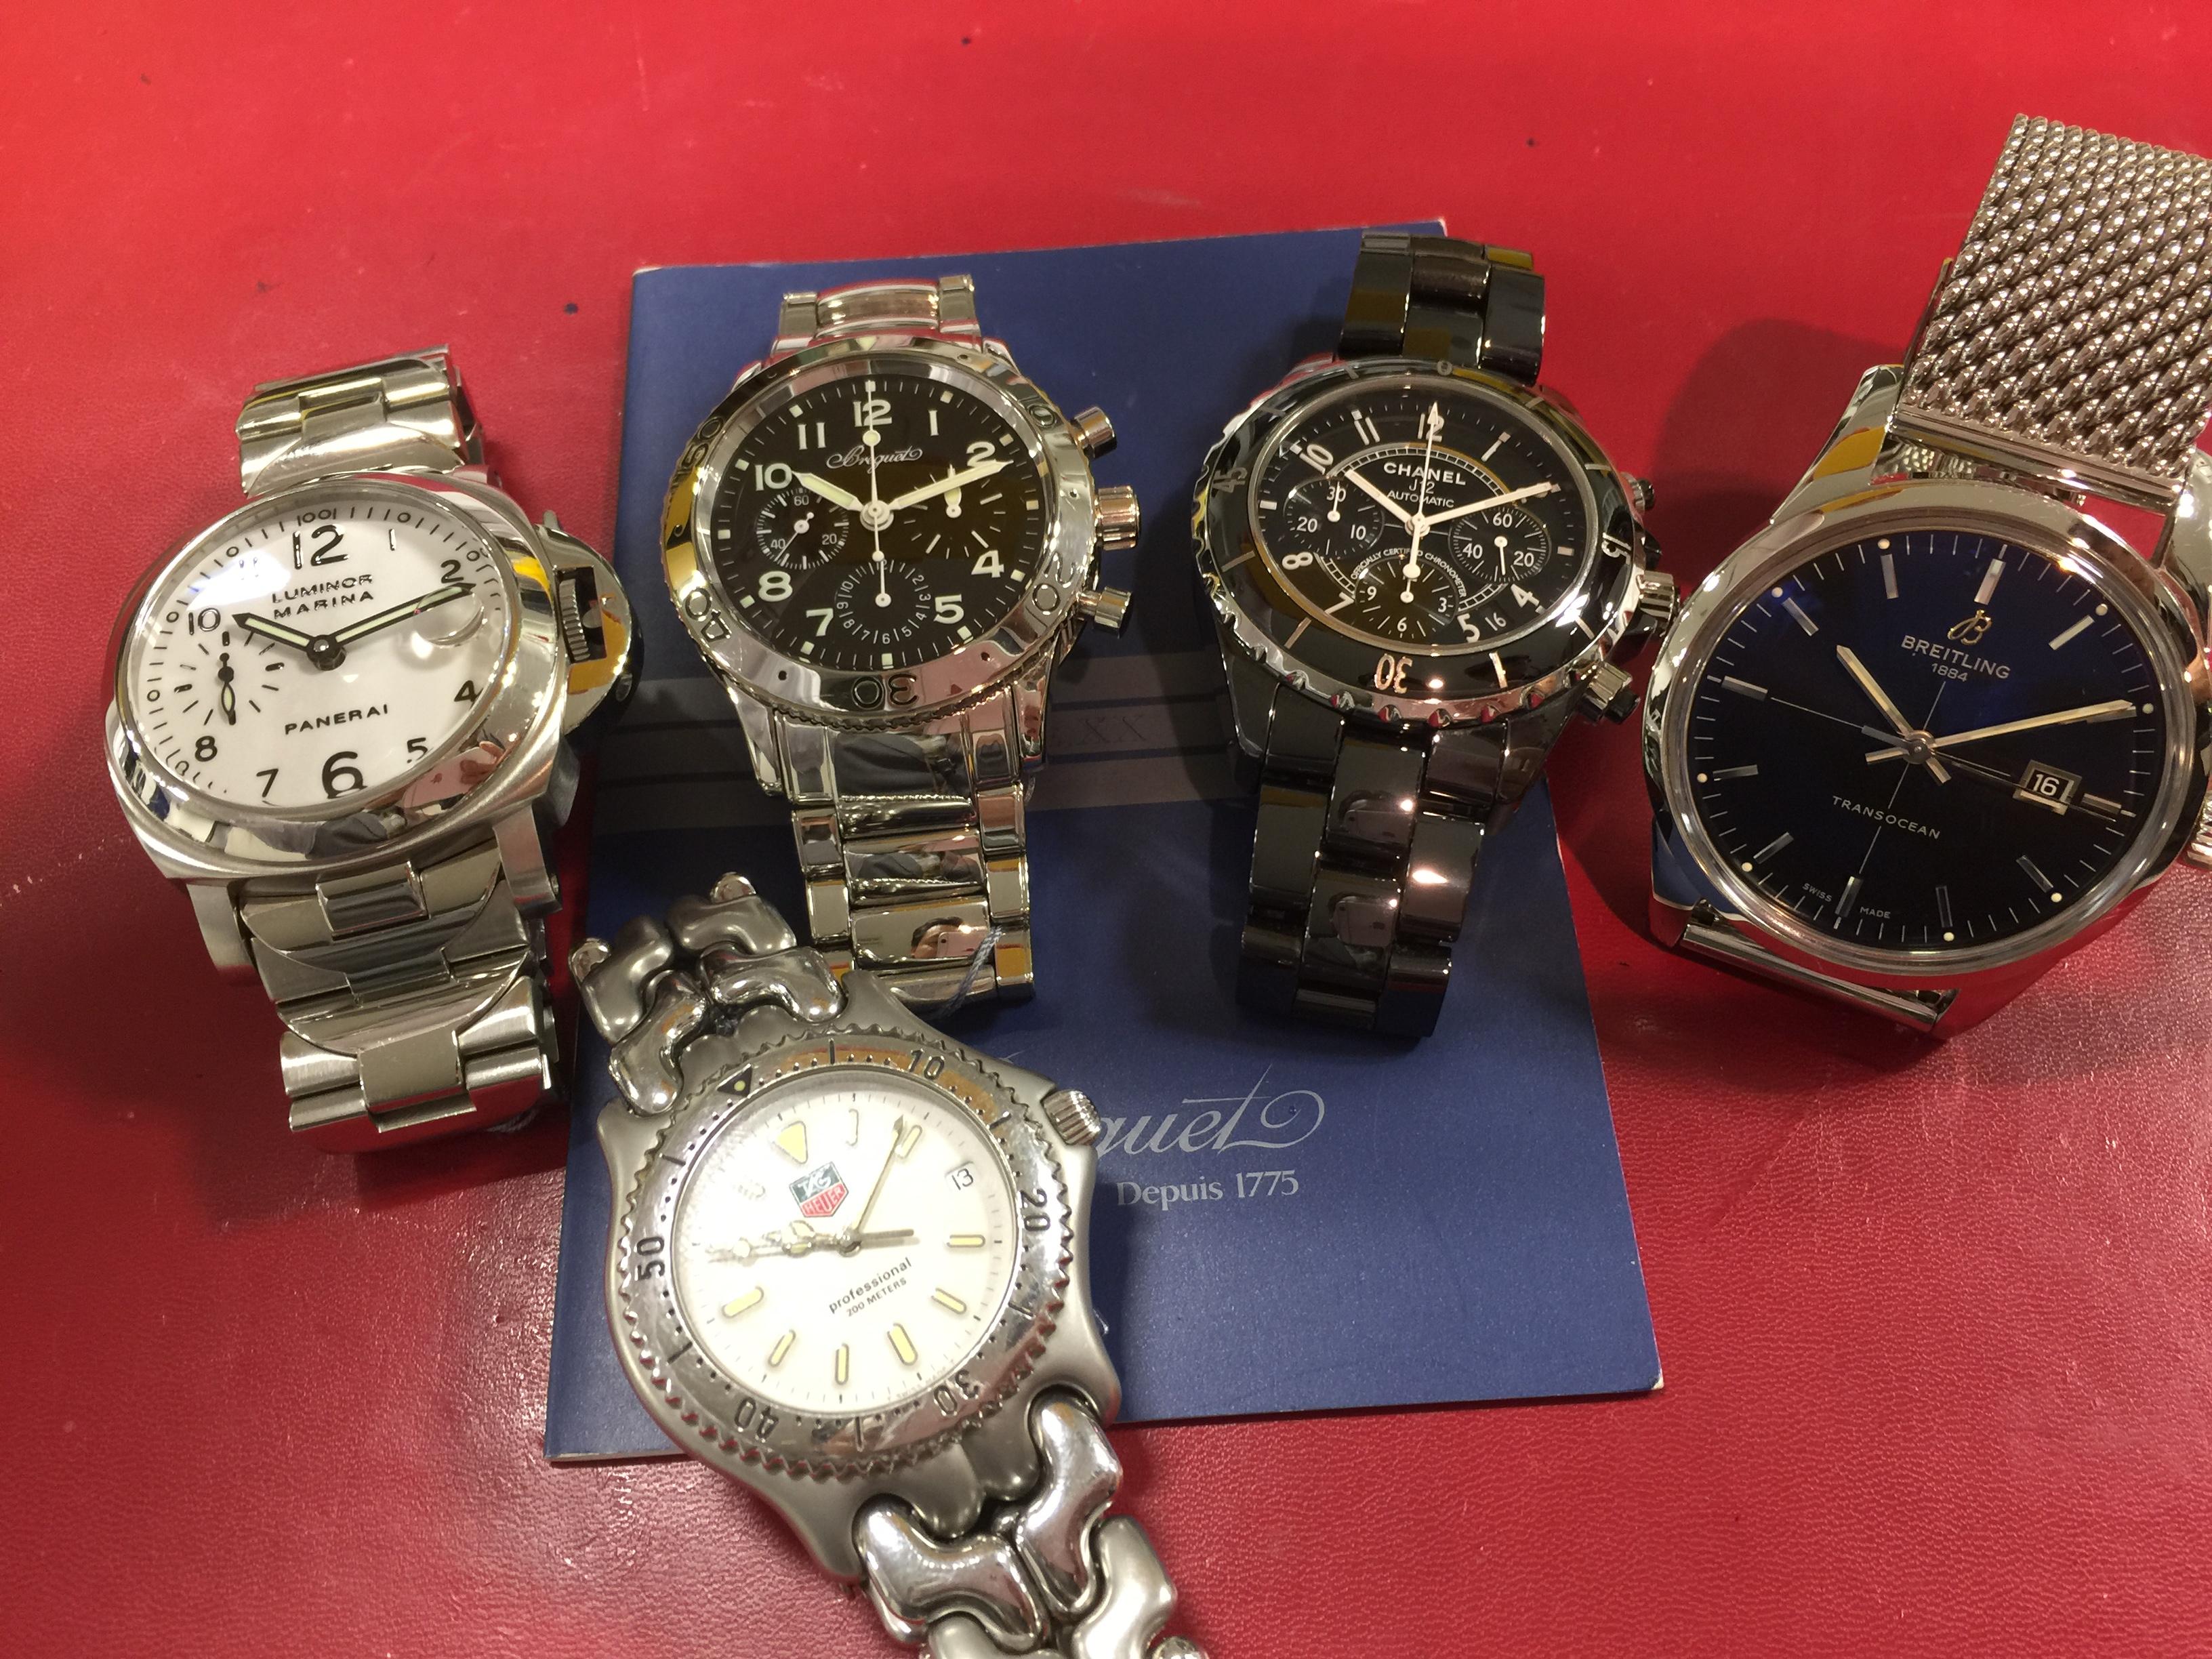 online retailer 790e4 dca4a ブレゲ BREGUET アエロナバル 3800ST , 他4本 | 時計の高価買取 ...